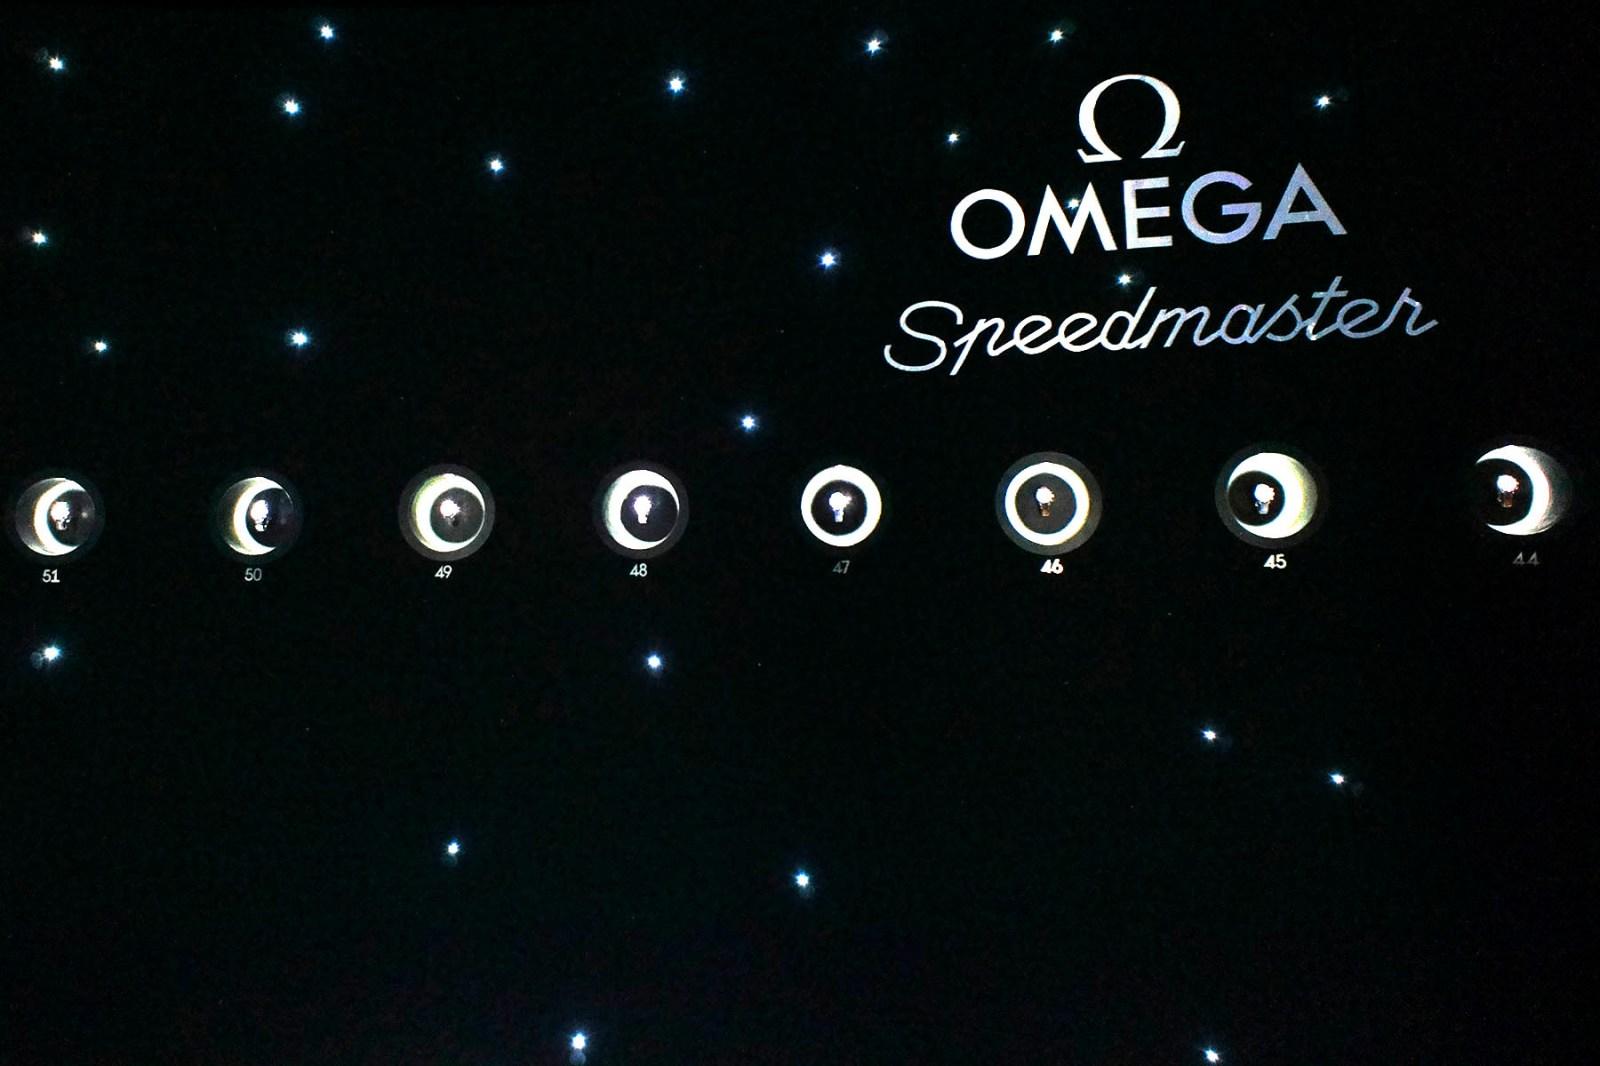 OMEGA 上海 Speedmaster 60 周年盛宴回顧